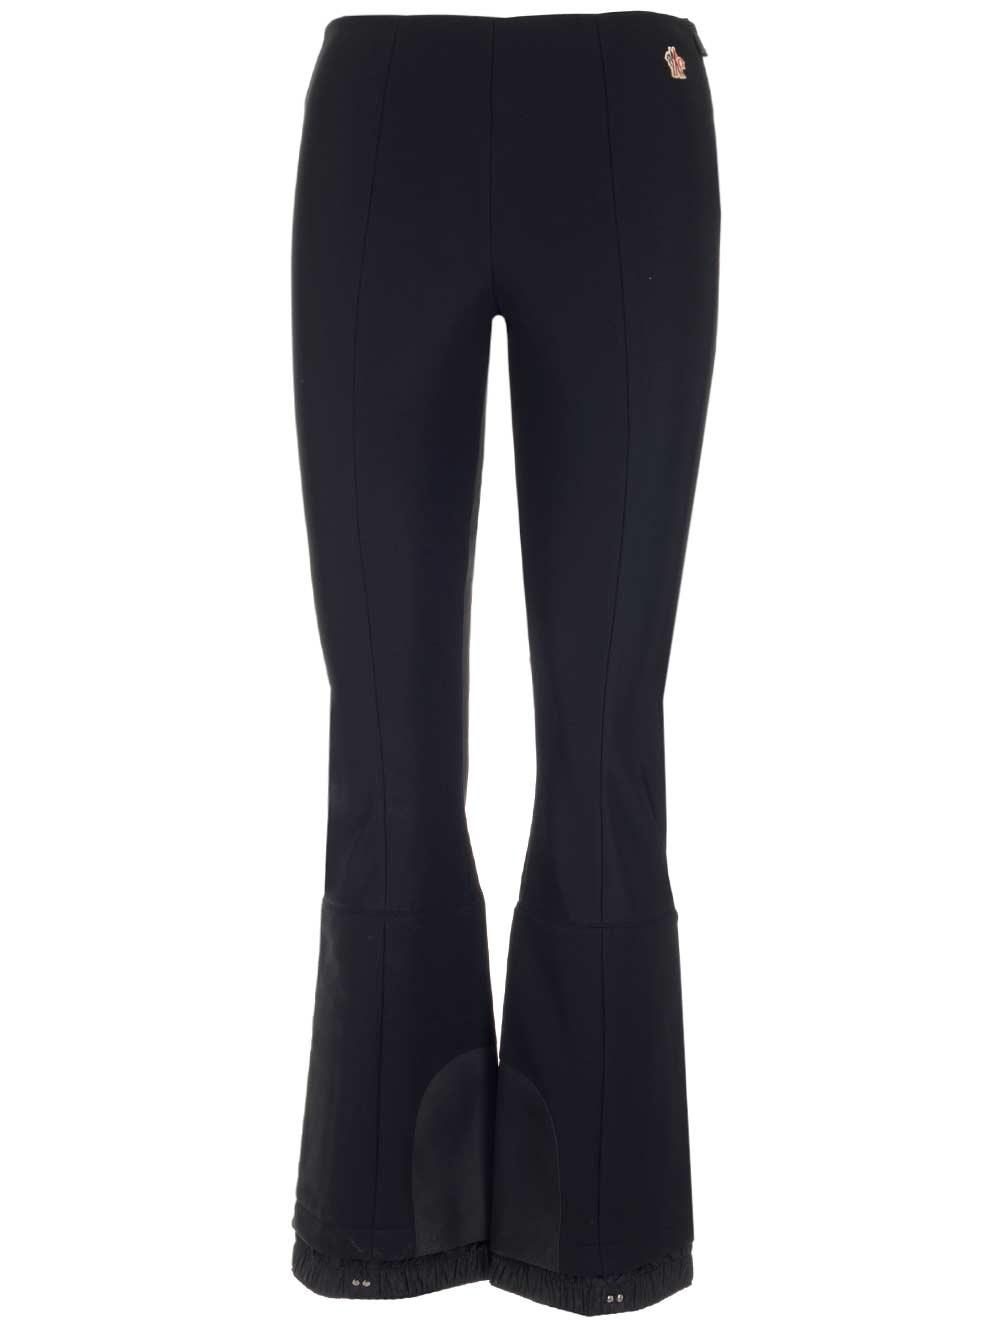 MONCLER GRENOBLE Black Slim Fit Sky Trousers